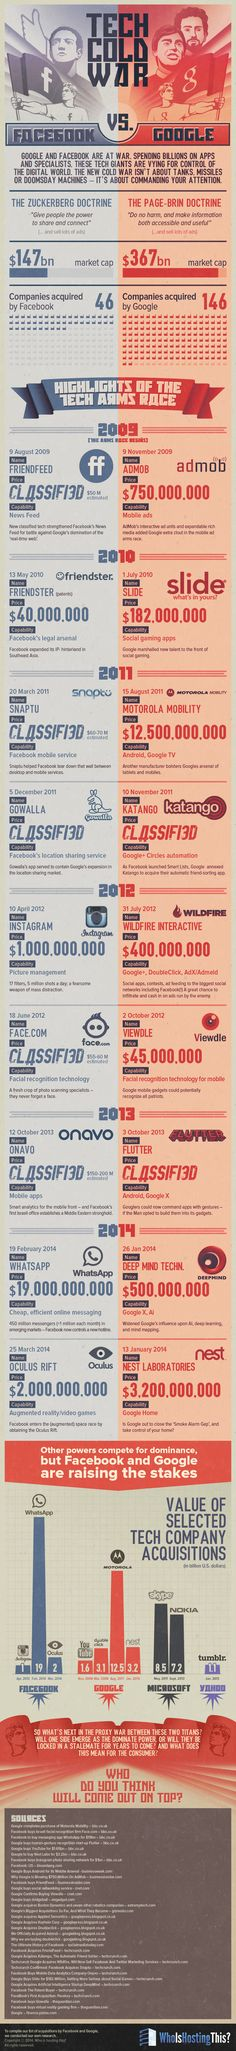 Google vs Facebook: Who Will Dominate?